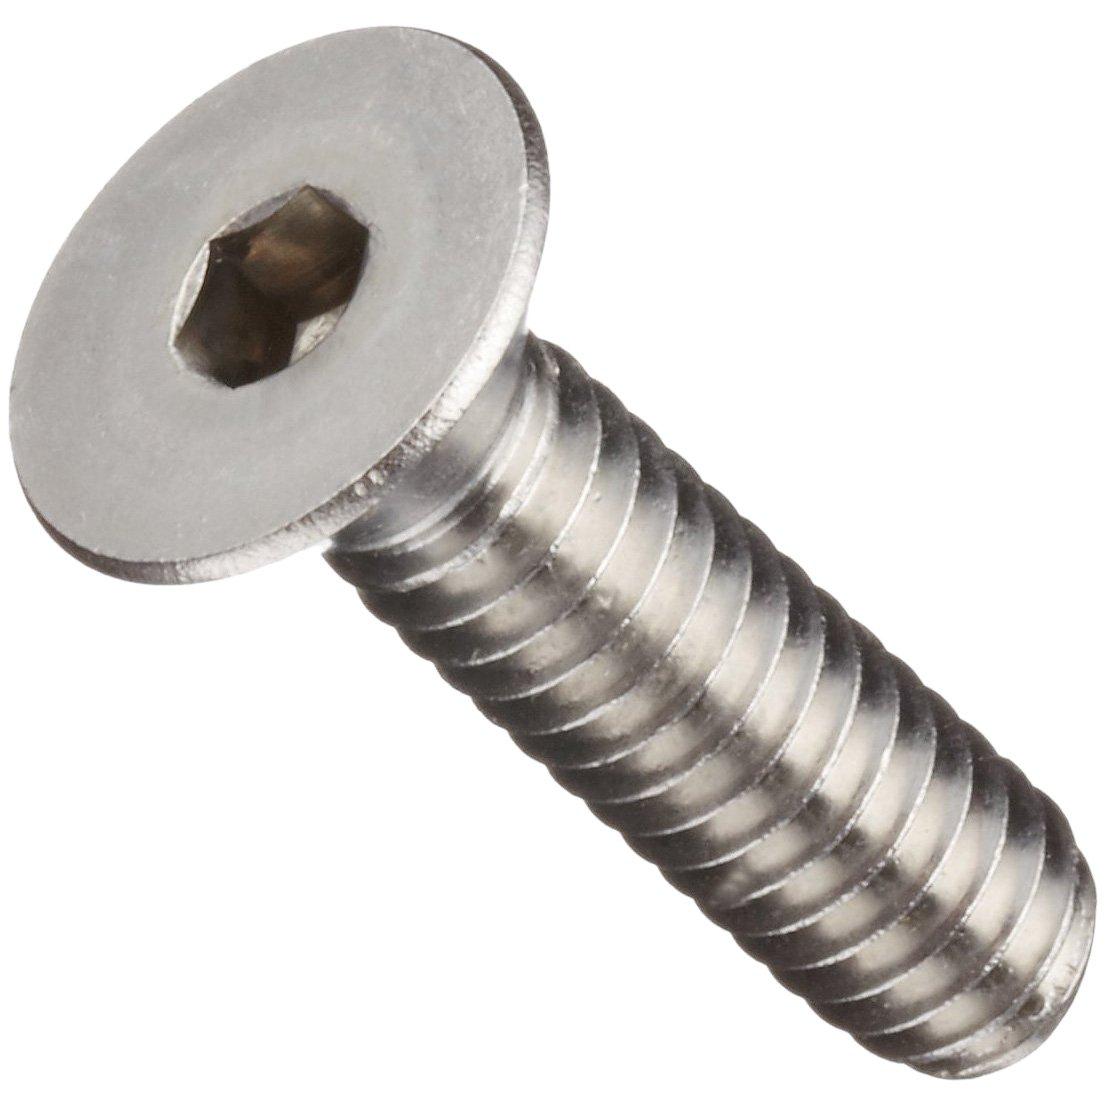 18-8 Stainless Steel Socket Cap Screw, Flat Head, Hex Socket Drive, Meets ASME B18.3/ASTM F879, 1/2'' Length, Fully Threaded, 5/16''-18 Threads (Pack of 100)